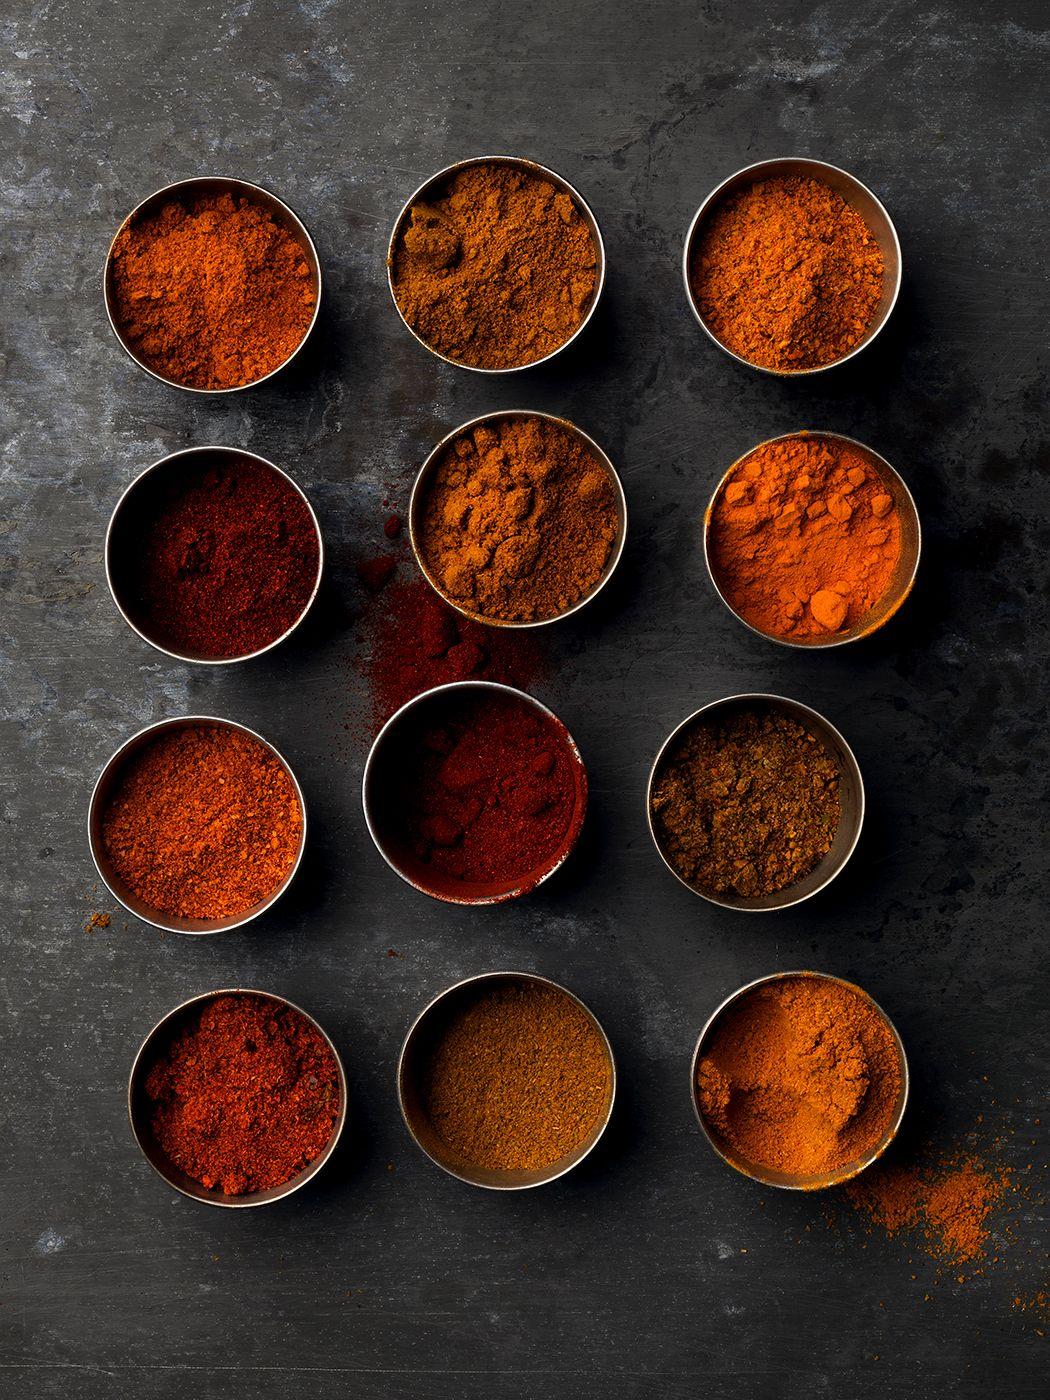 Spices - Charlie Drevstam, Photography